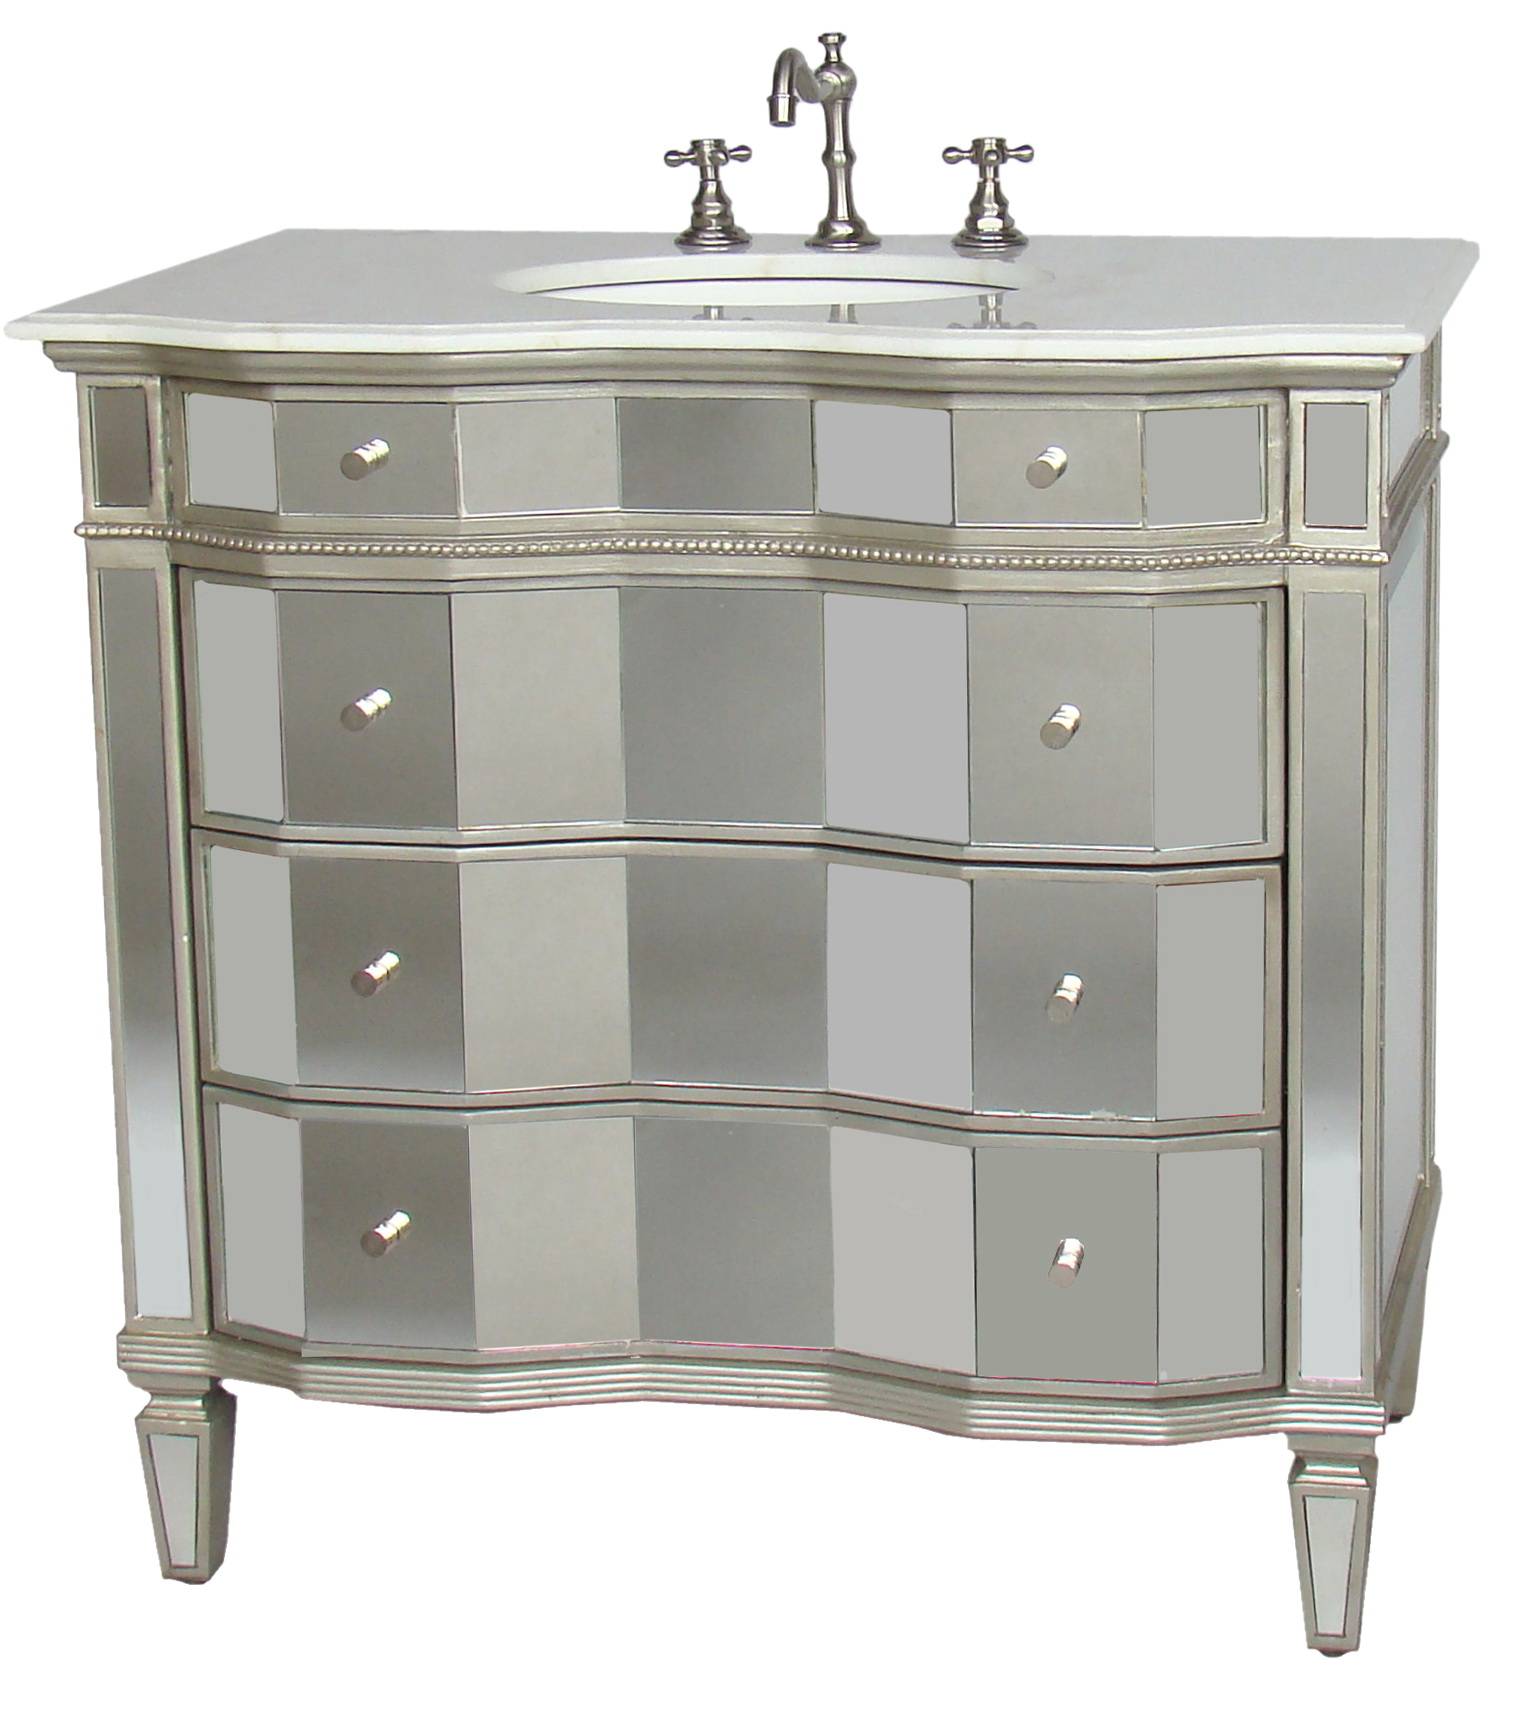 Mirrored bathroom vanity units - Mirrored Bathroom Vanity Units